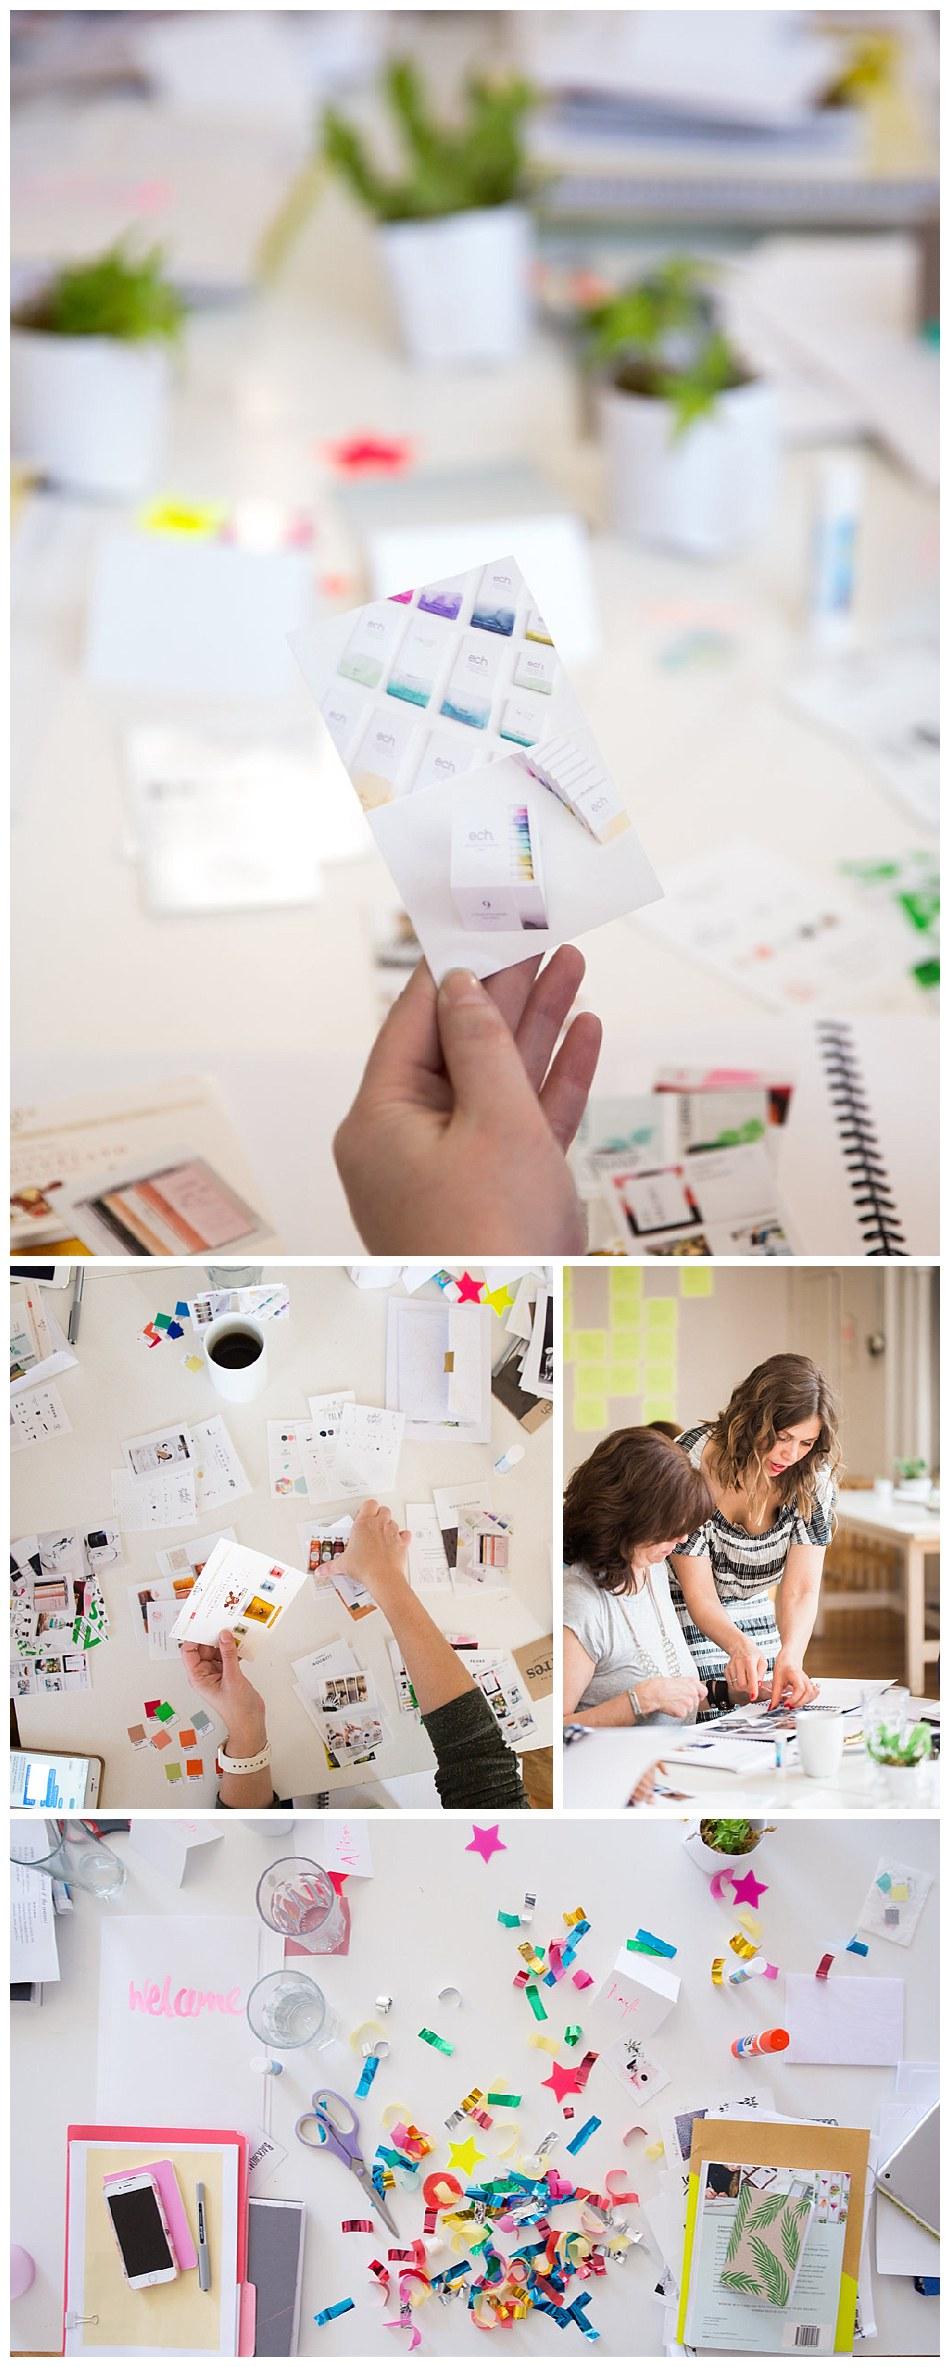 The Brand Stylist Colour Psychology Workshop New York Fiona Humberstone_0065